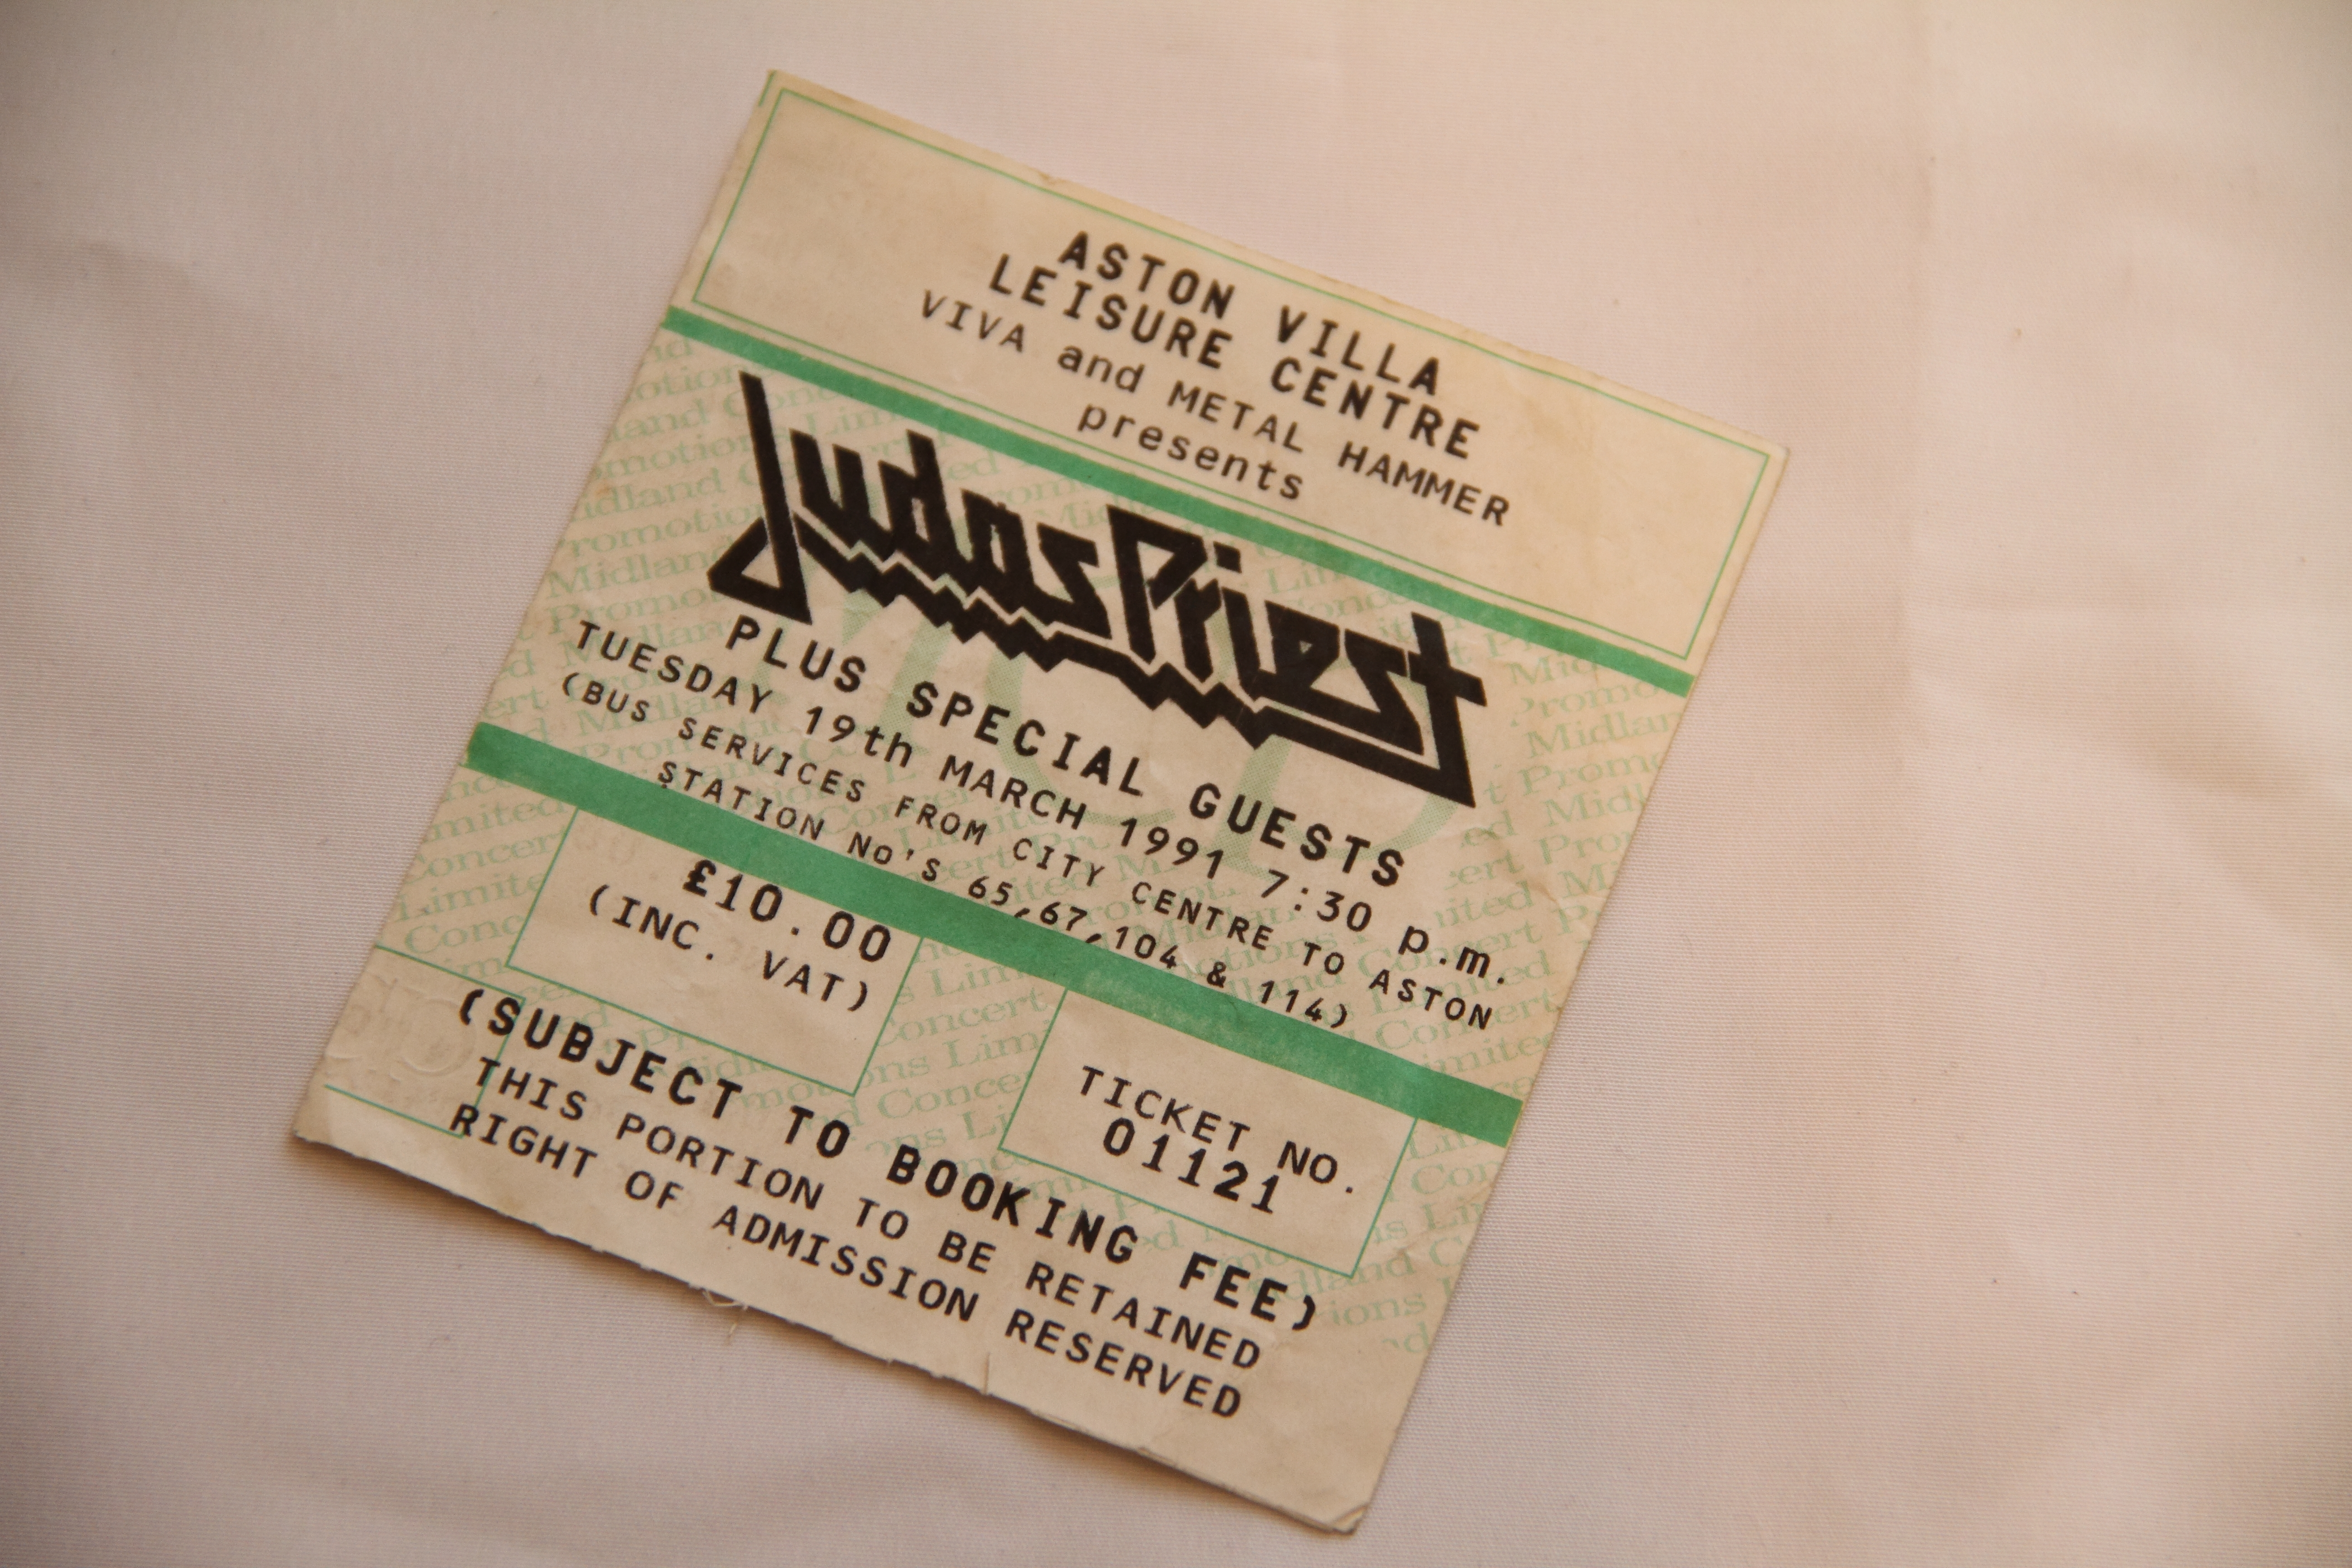 Home Of Metal Judas Priest Opening Date Of Painkiller